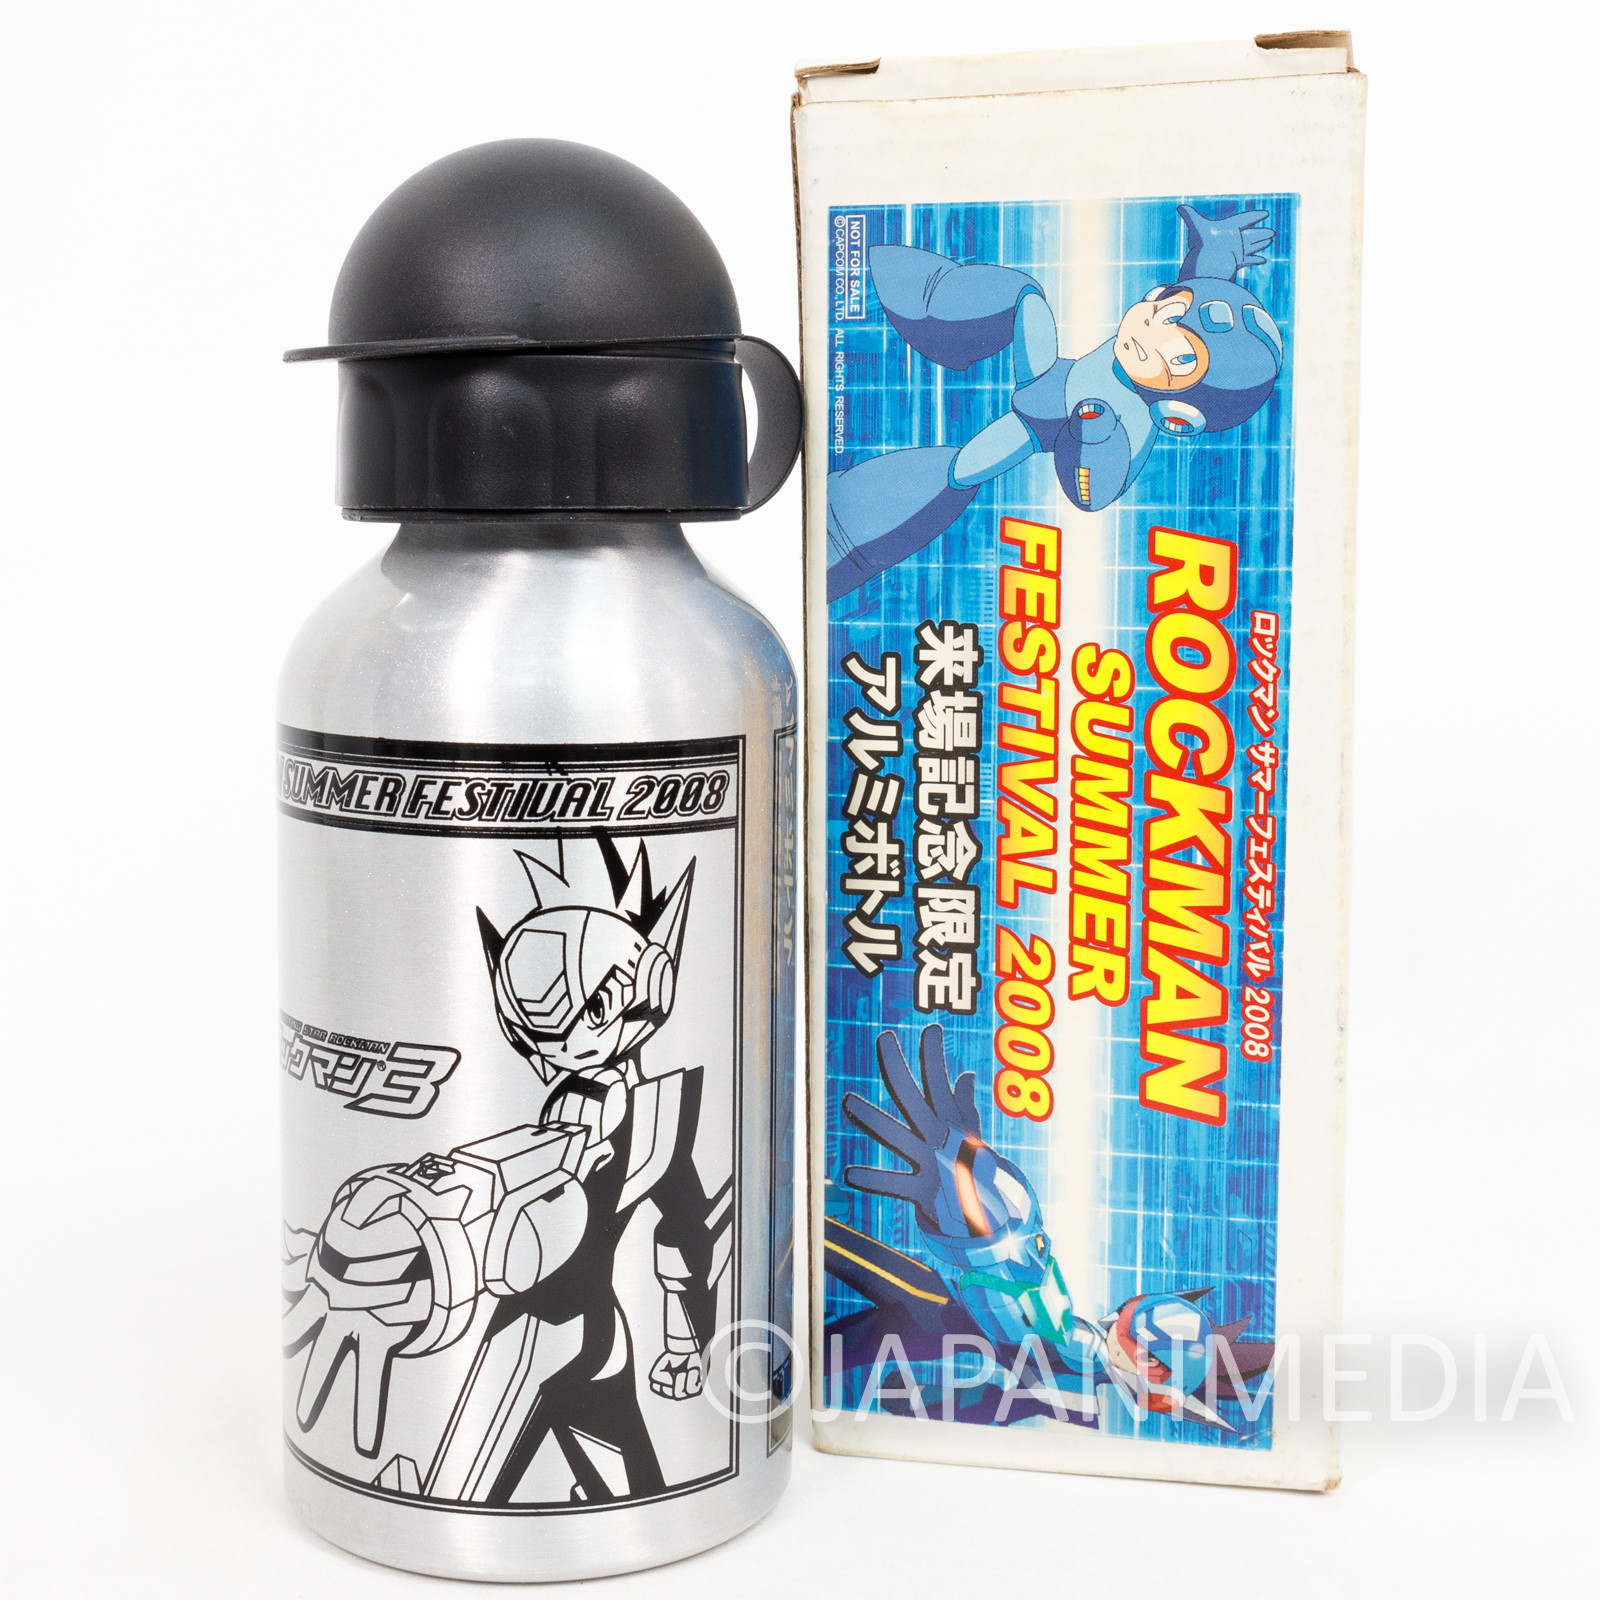 MEGA MAN Rockman Aluminum Water Bottle Summer Festival 2008 JAPAN GAME